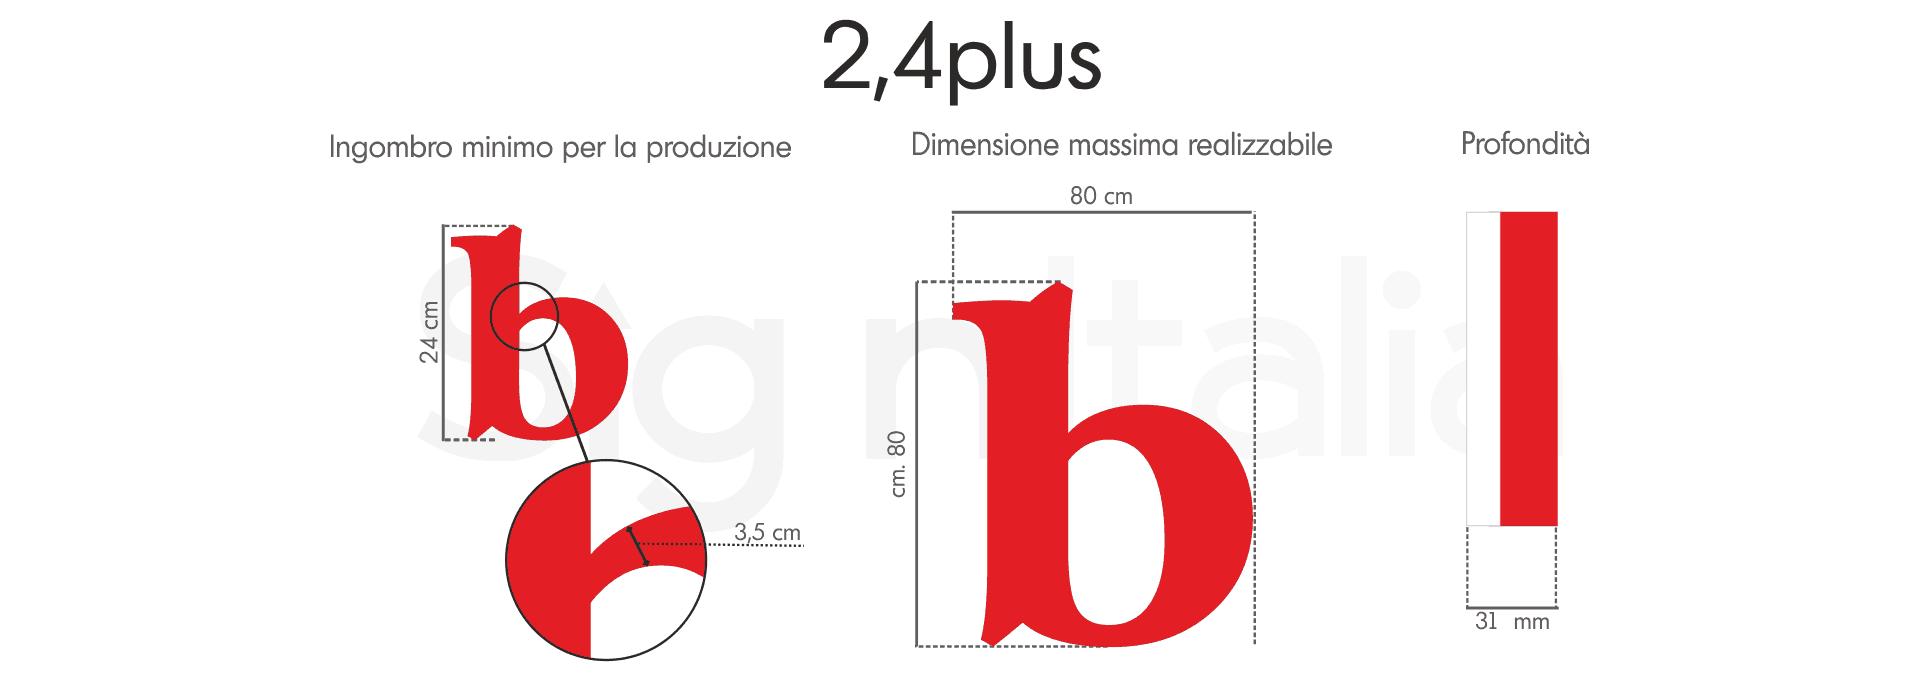 lettera 2,4 plus